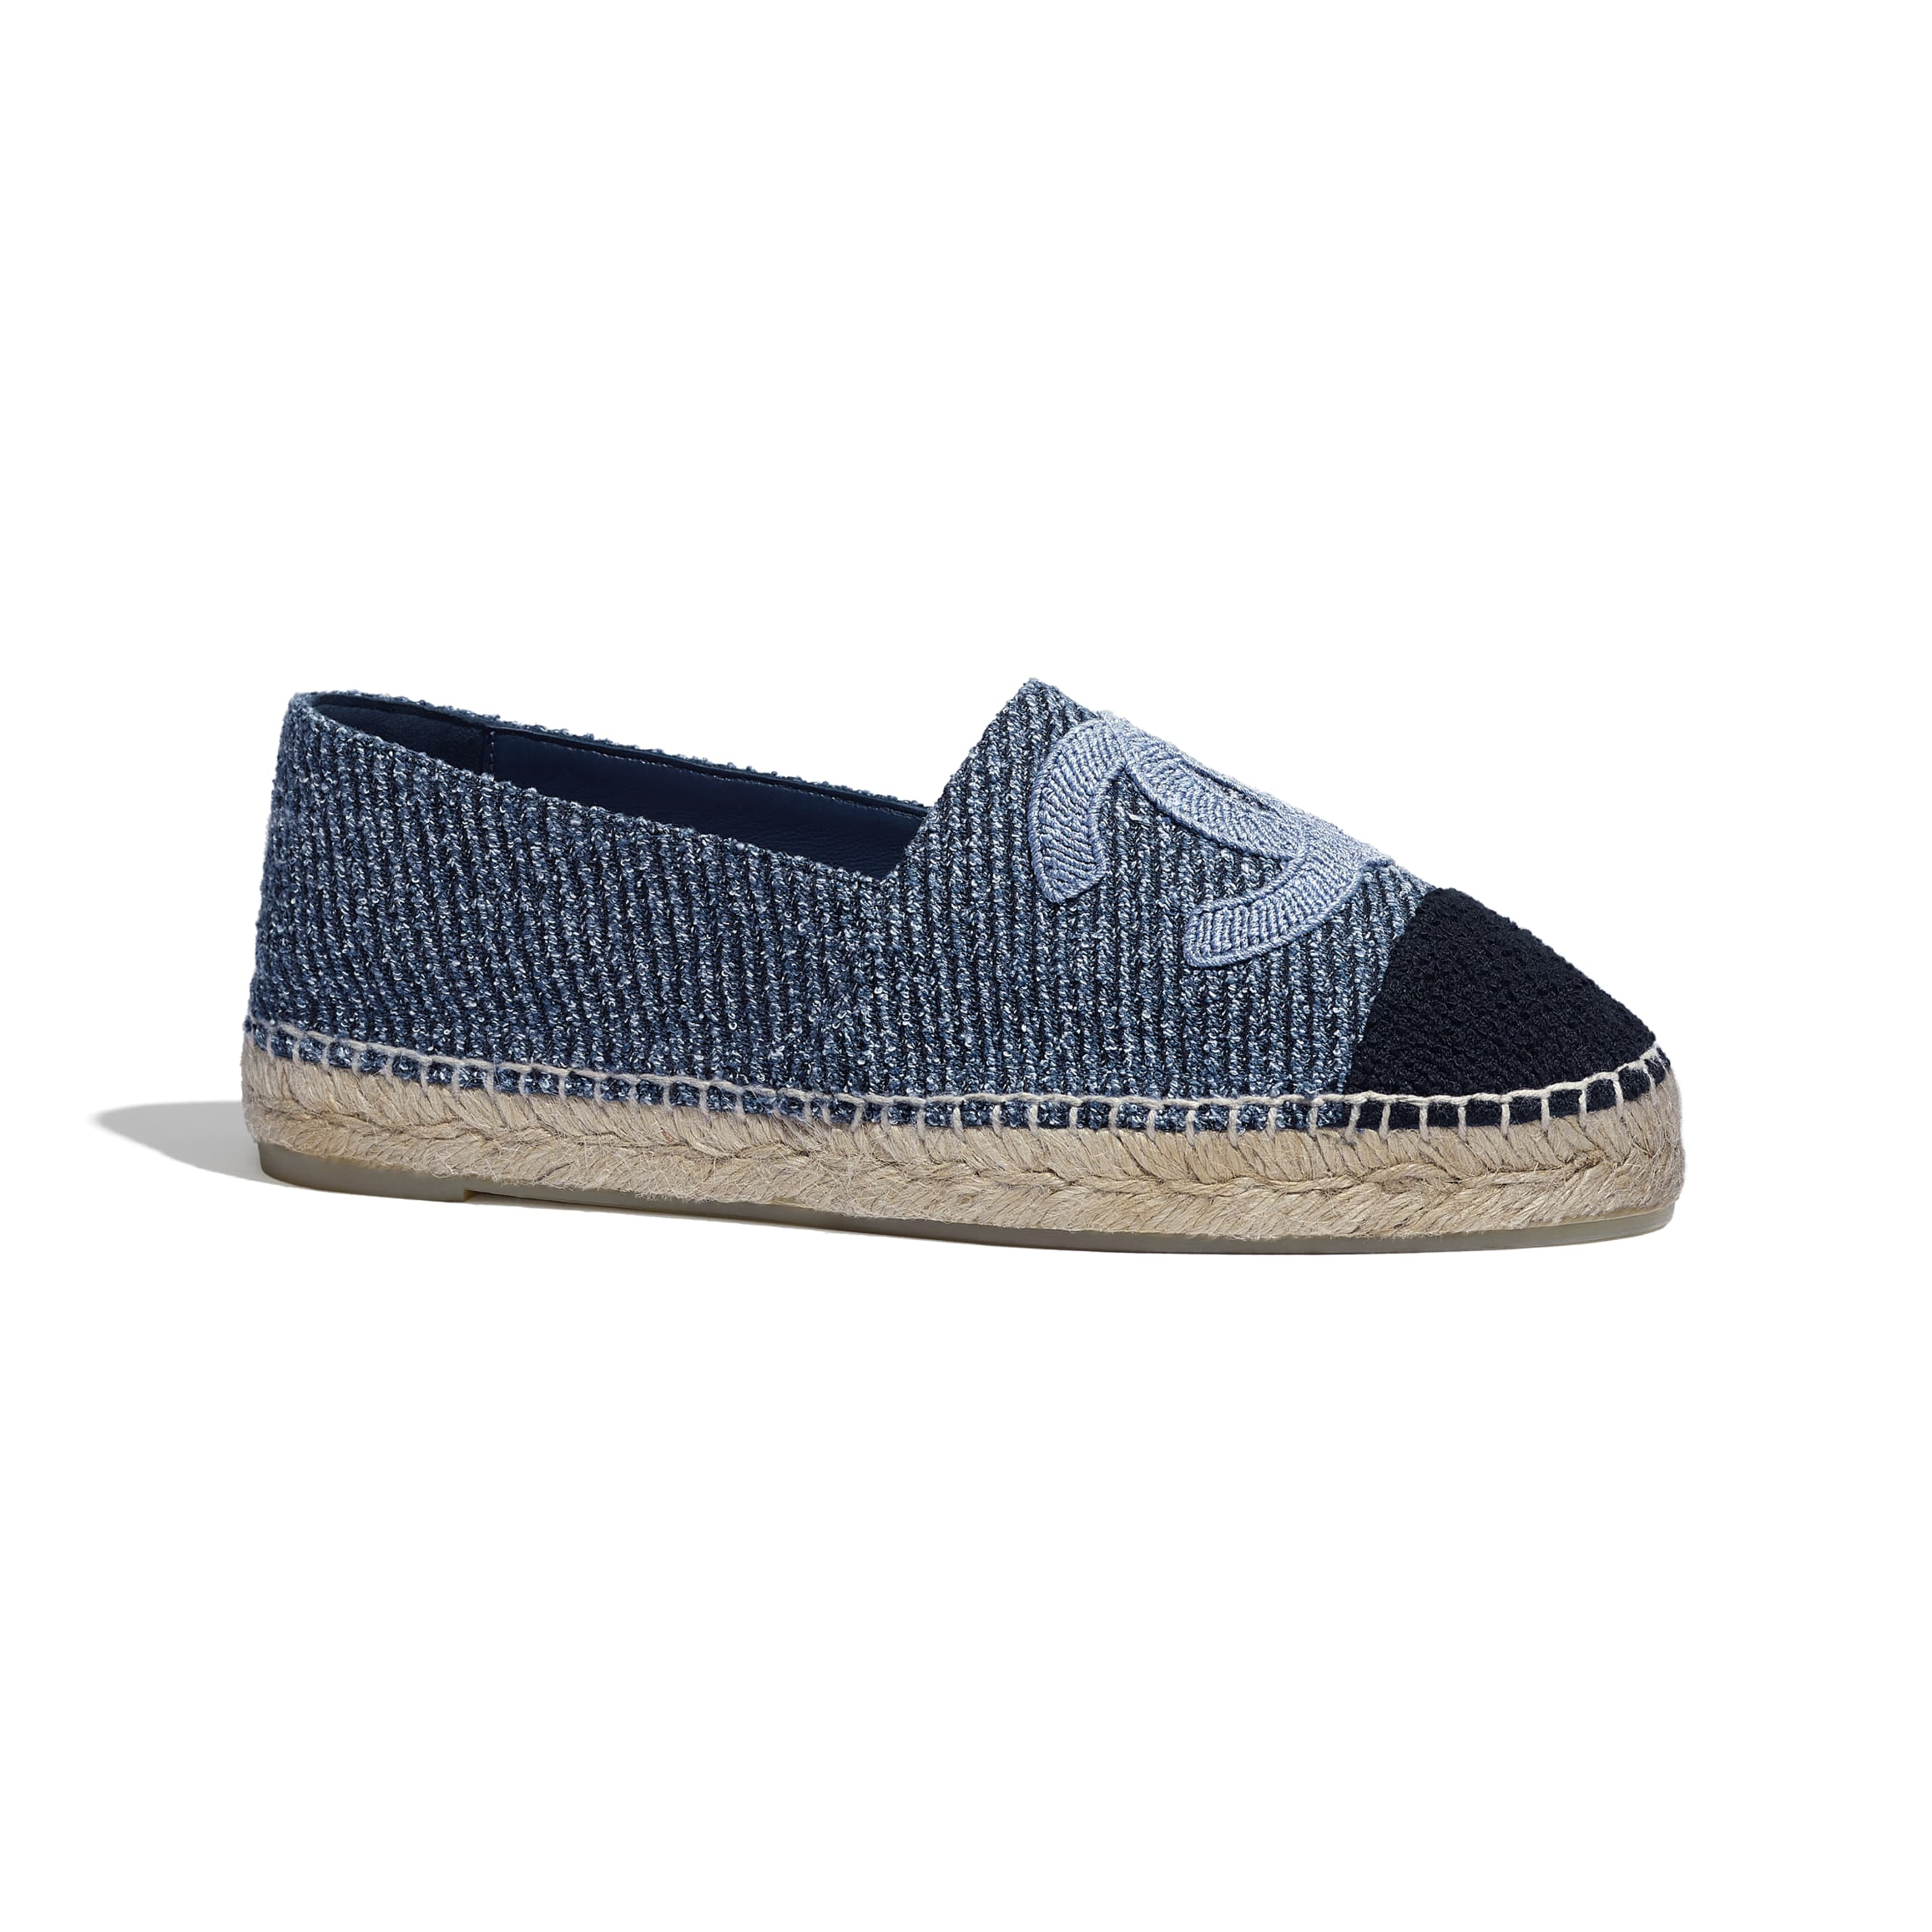 Espadrilles - Blue, Ecru & Black - Cotton Tweed - CHANEL - Default view - see standard sized version